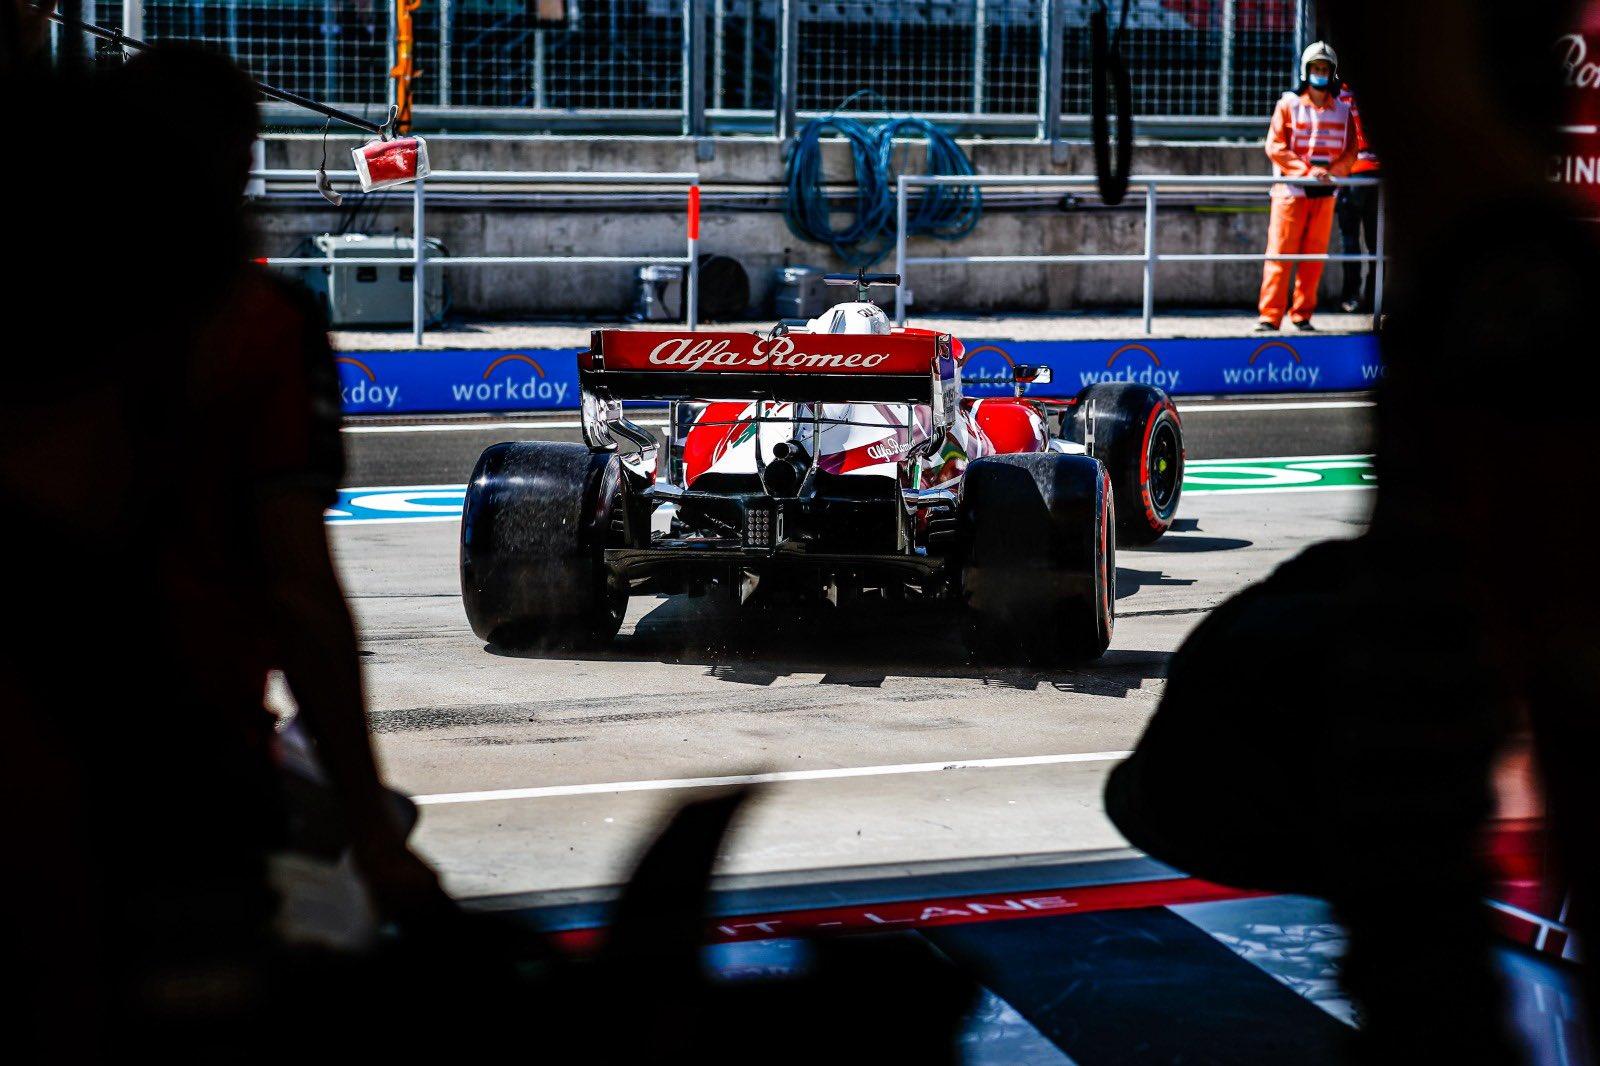 F1 - Officiel : Alfa Romeo à l'amende au GP de Hongrie